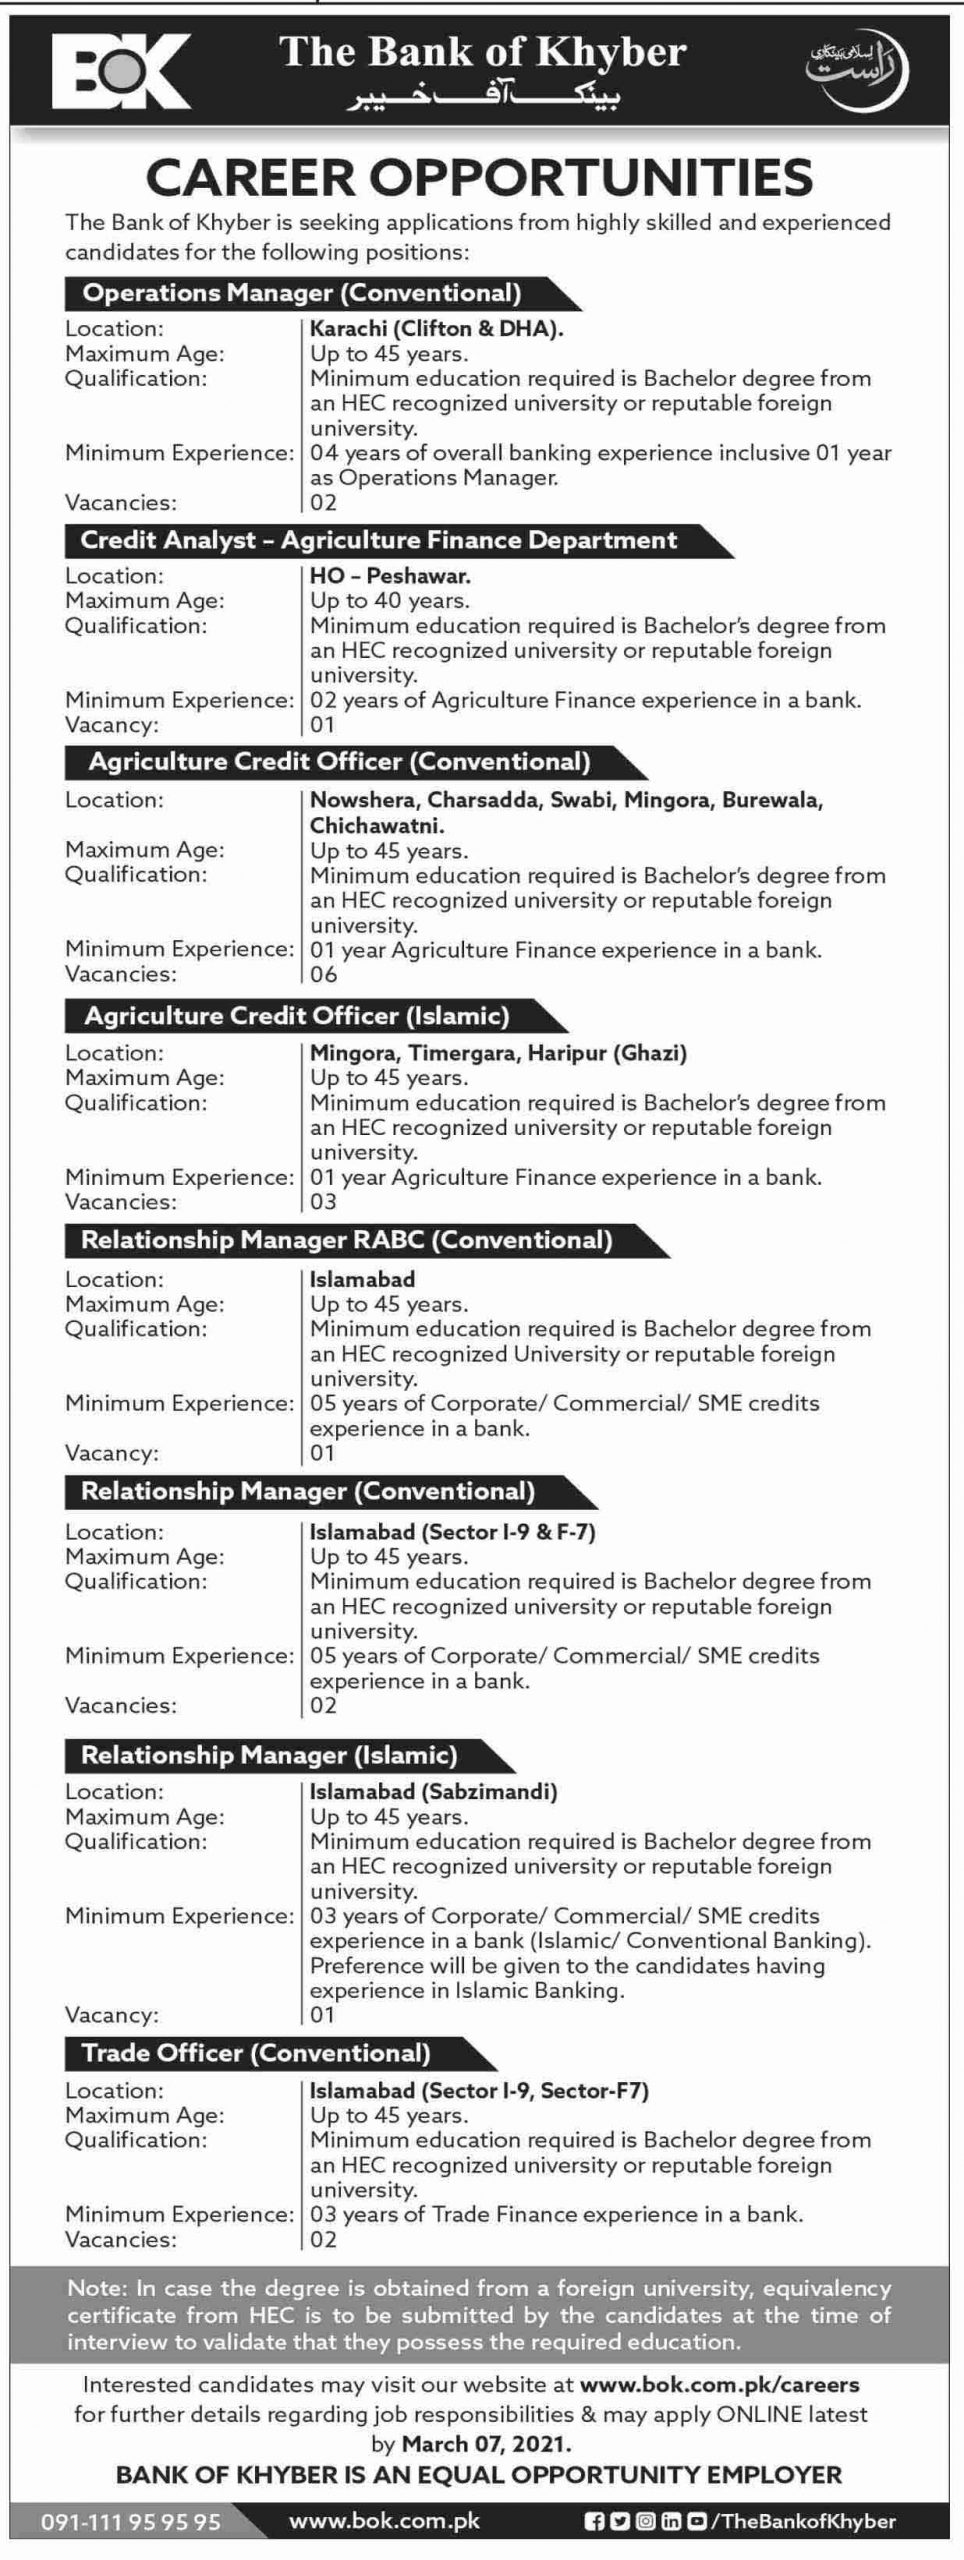 Bank of Khyber (BOK) Jobs